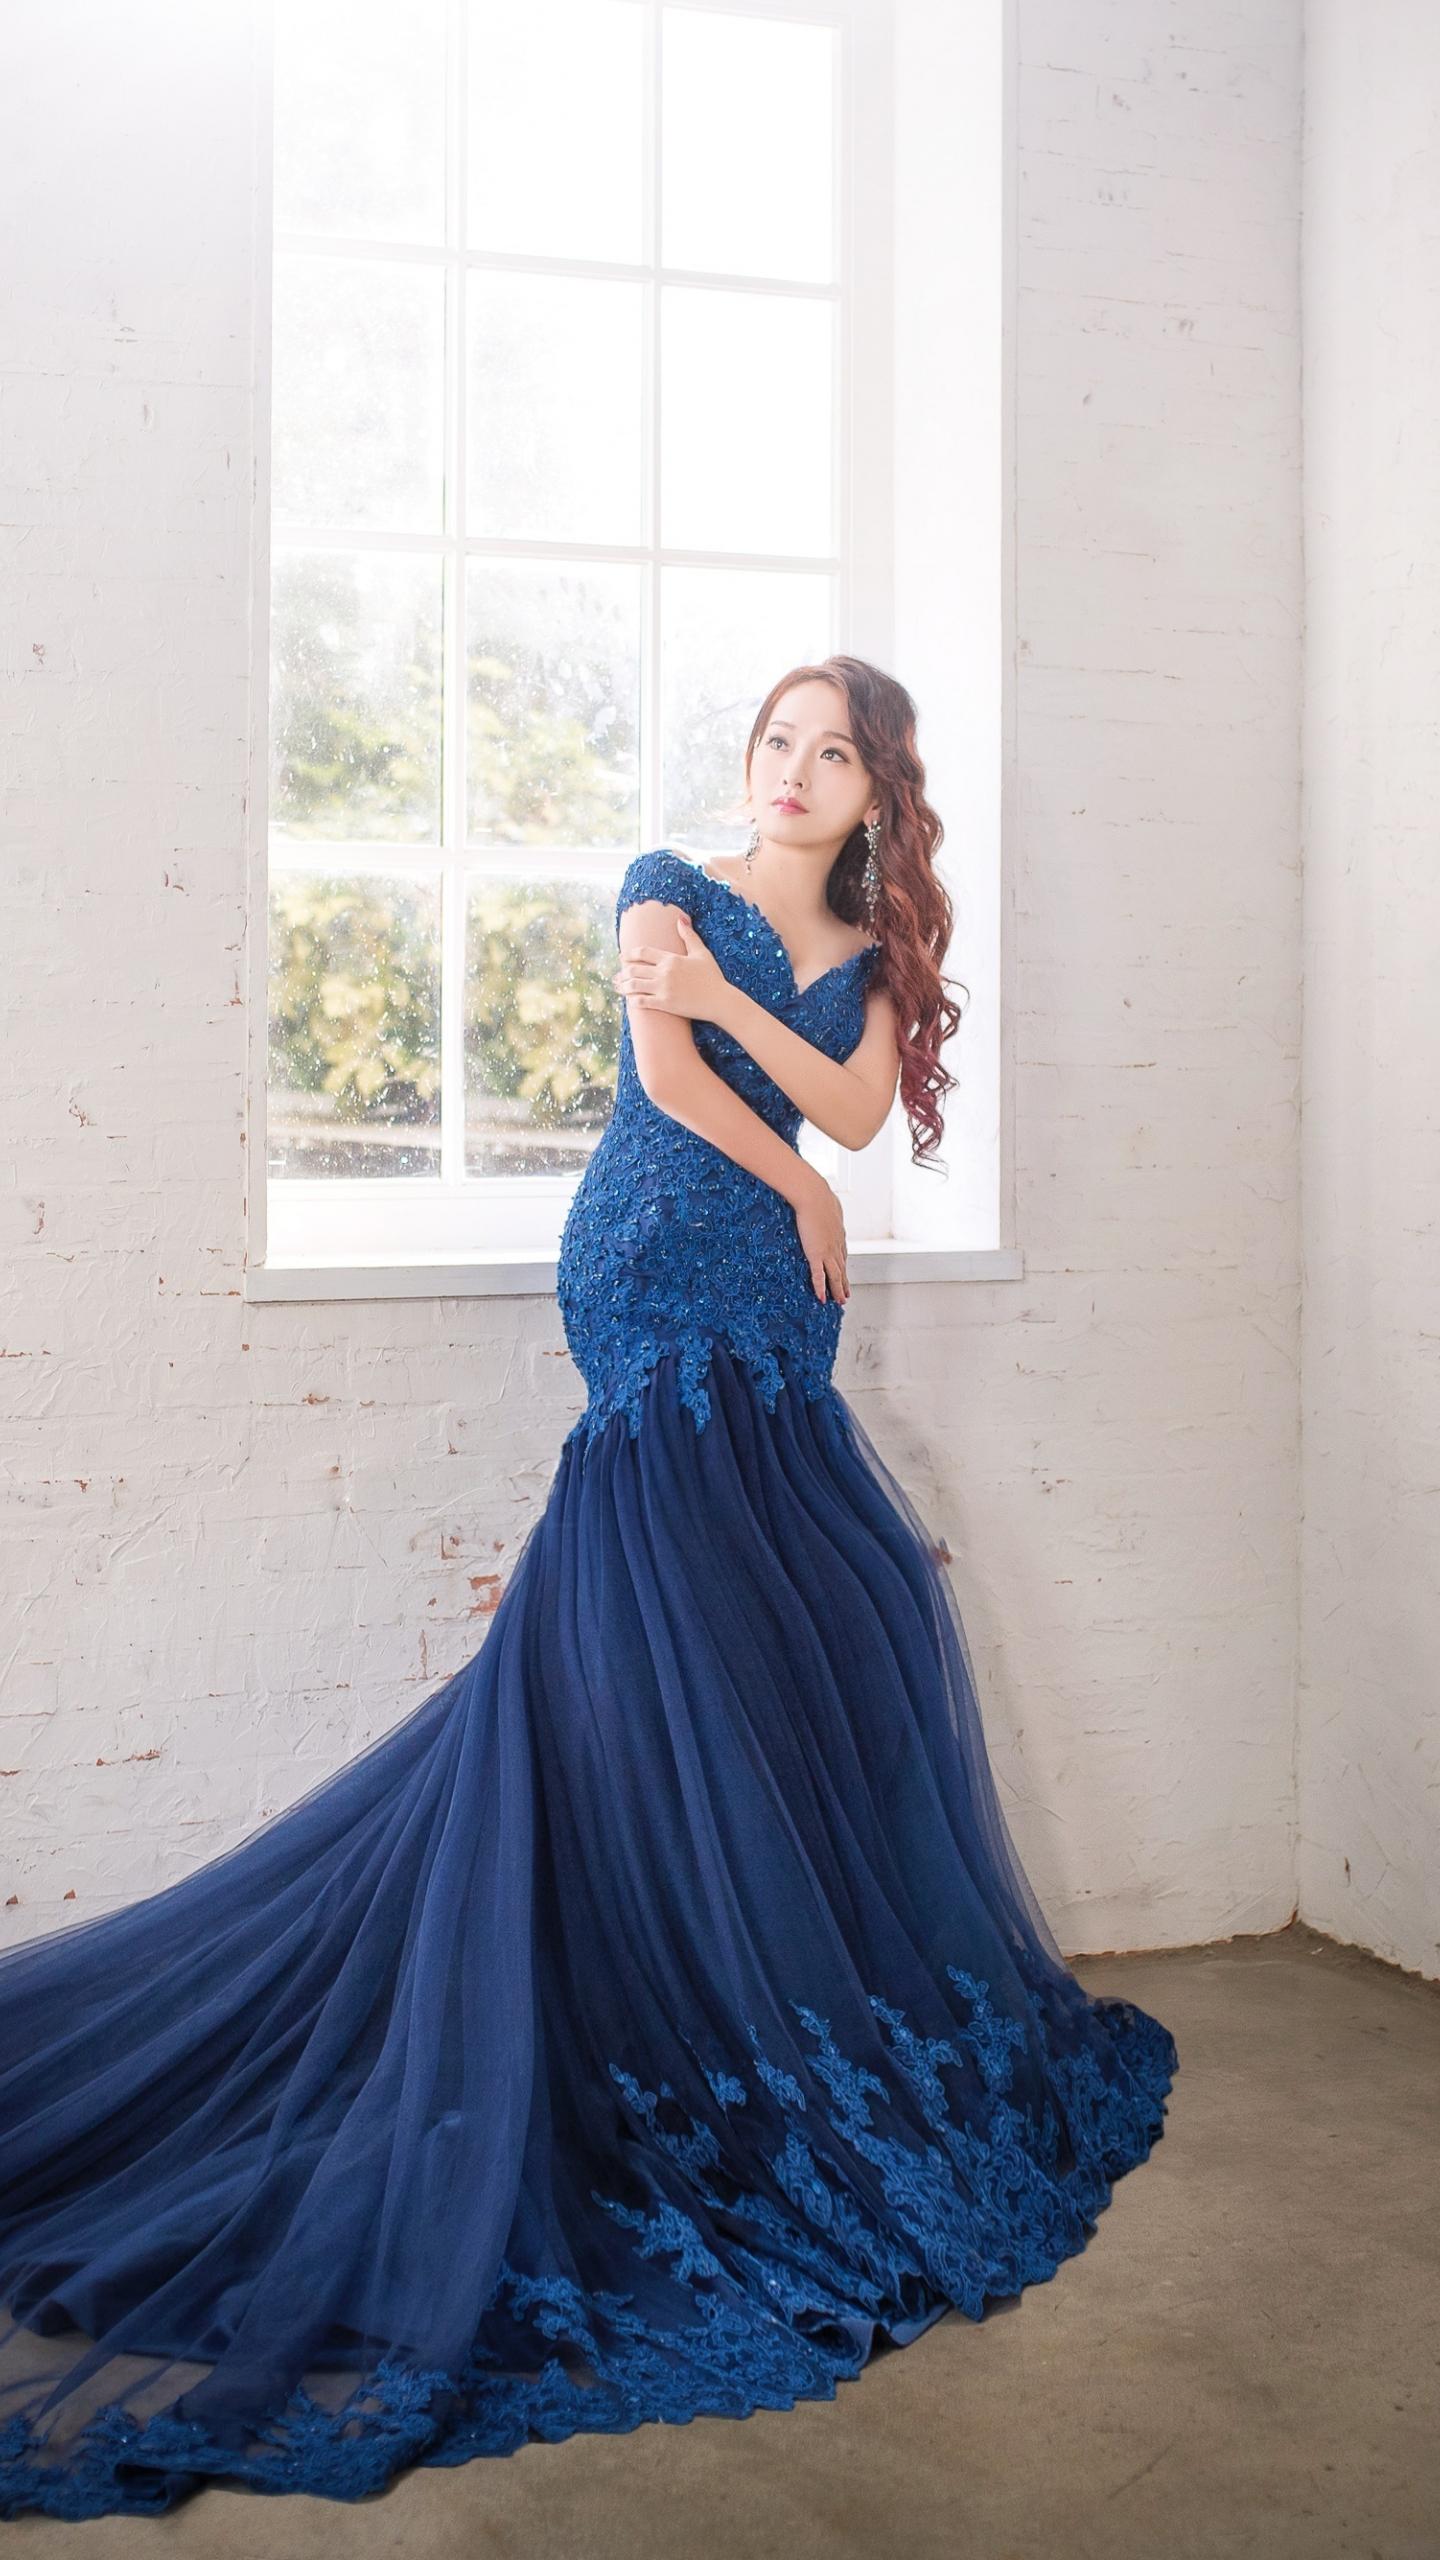 Asian woman, girl, model, blue dress, 1440x2560 wallpaper